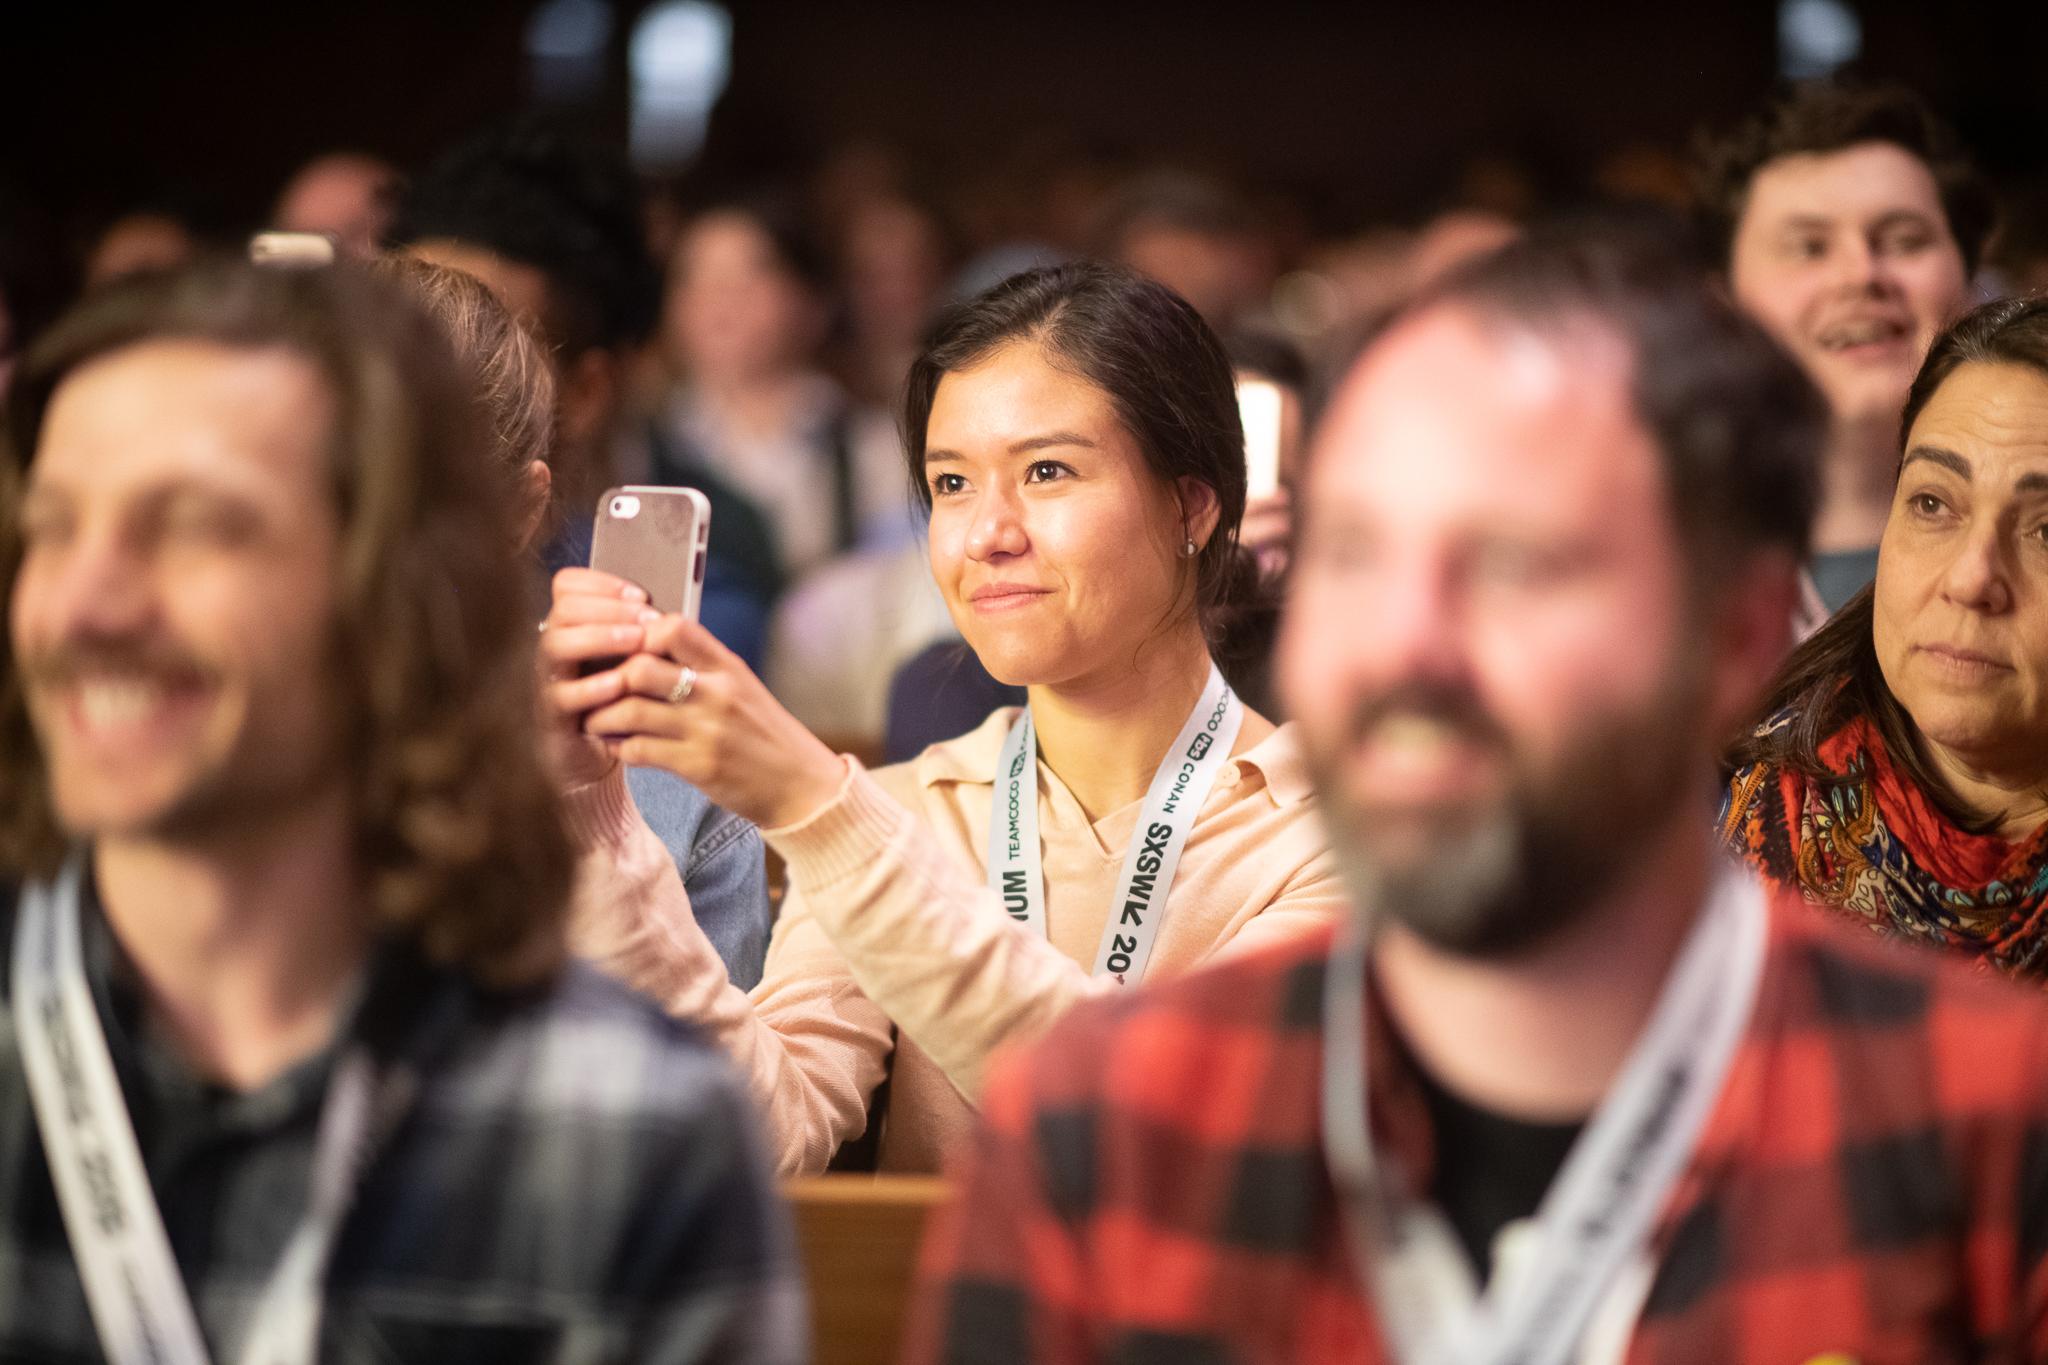 Attending SXSW   SXSW Conference & Festivals